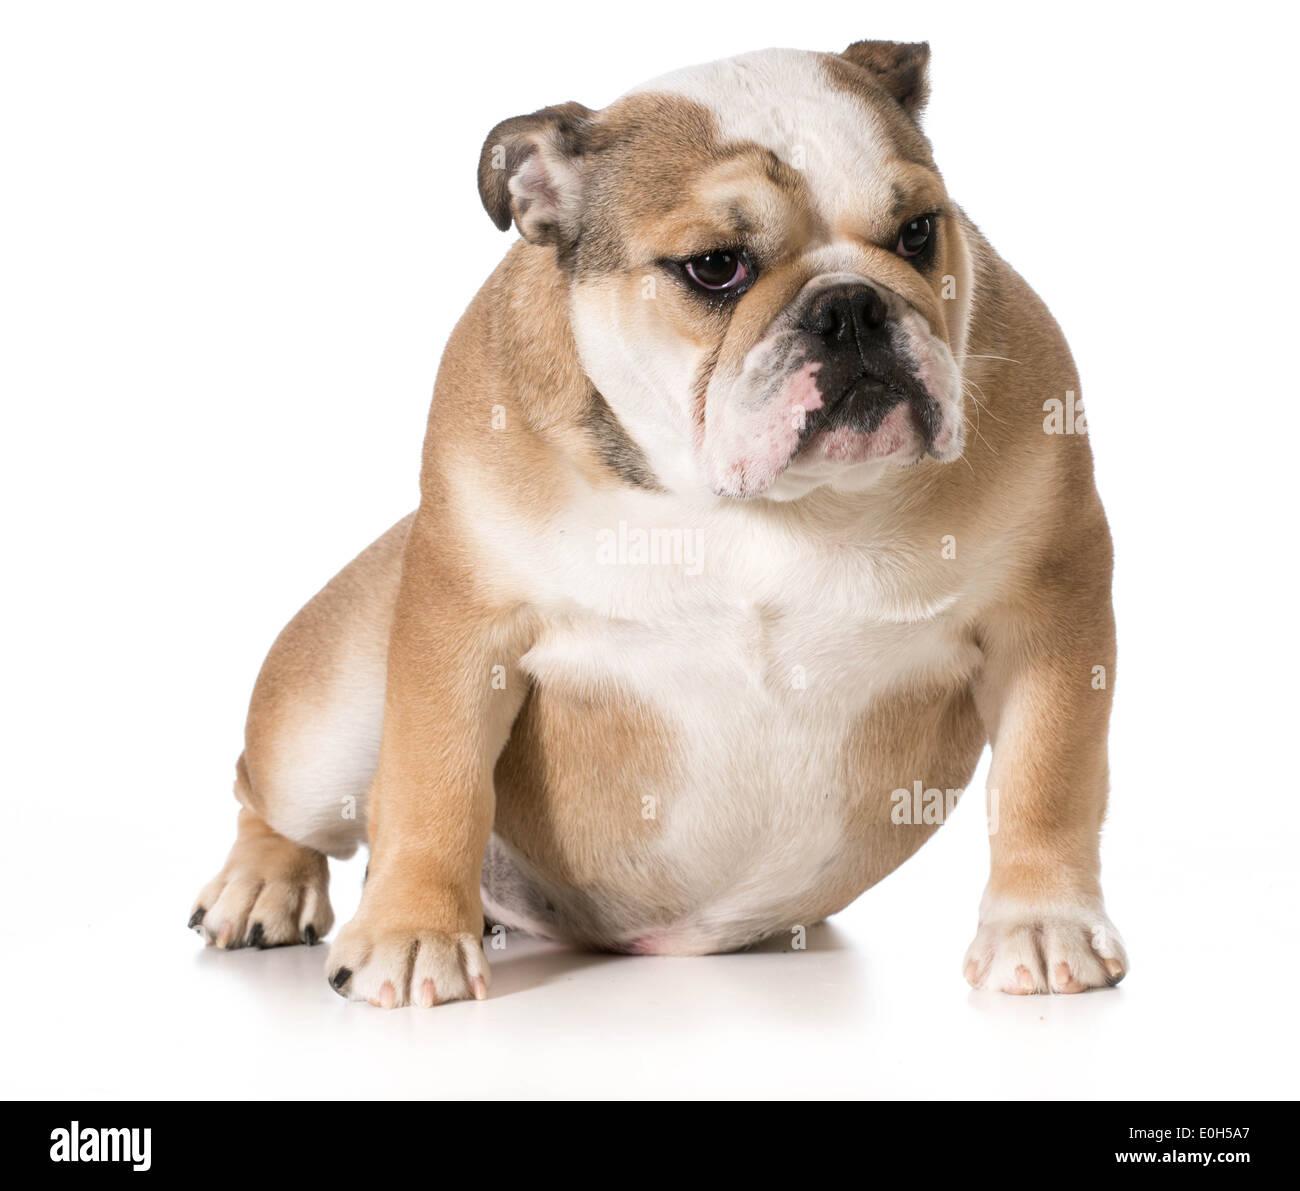 english bulldog sitting - 8 month old puppy - Stock Image